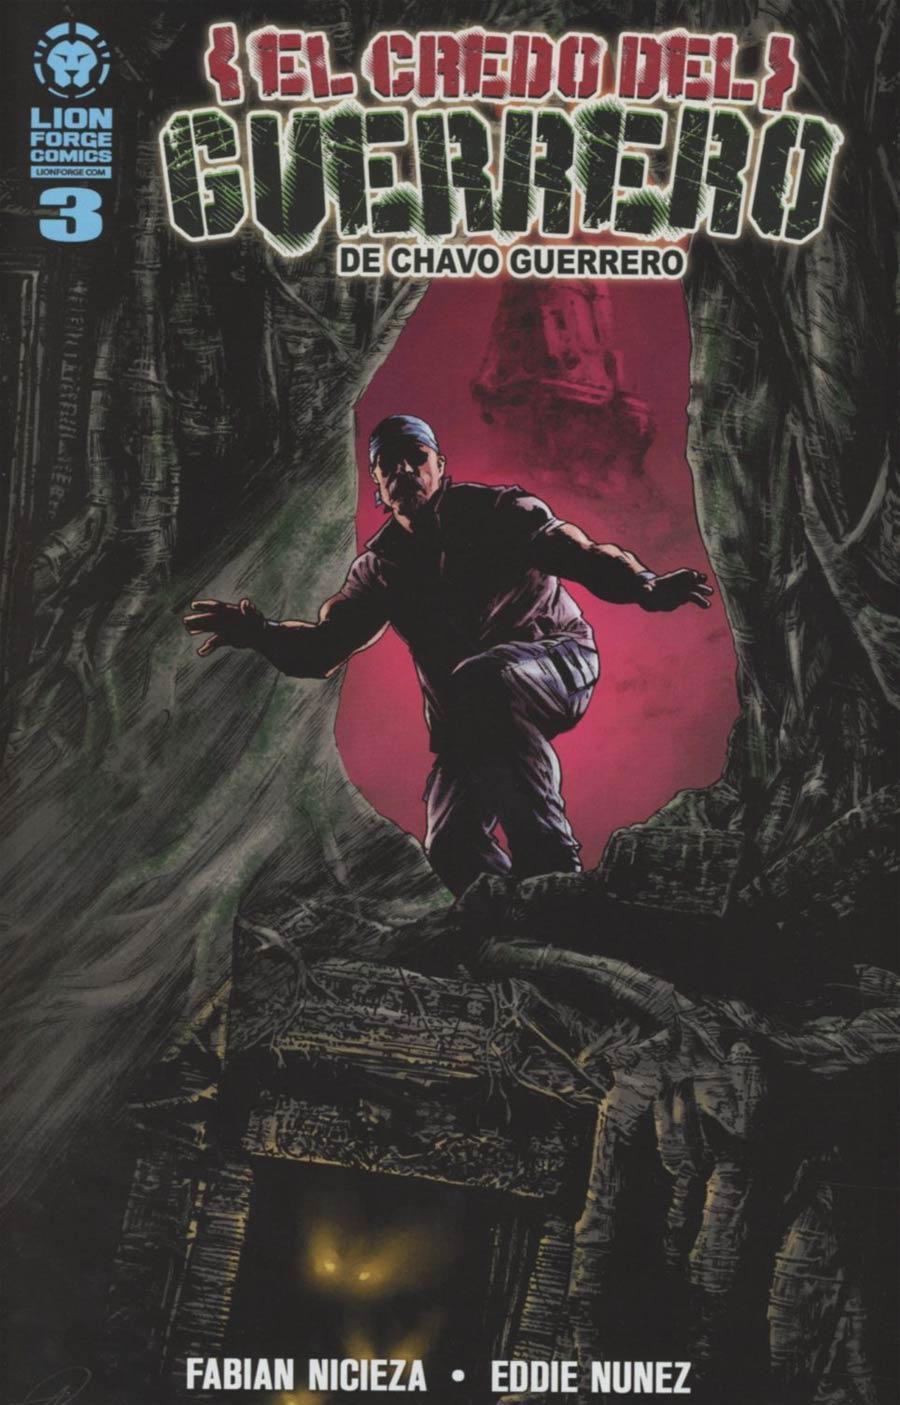 Chavo Guerreros Warriors Creed #3 Spanish Edition